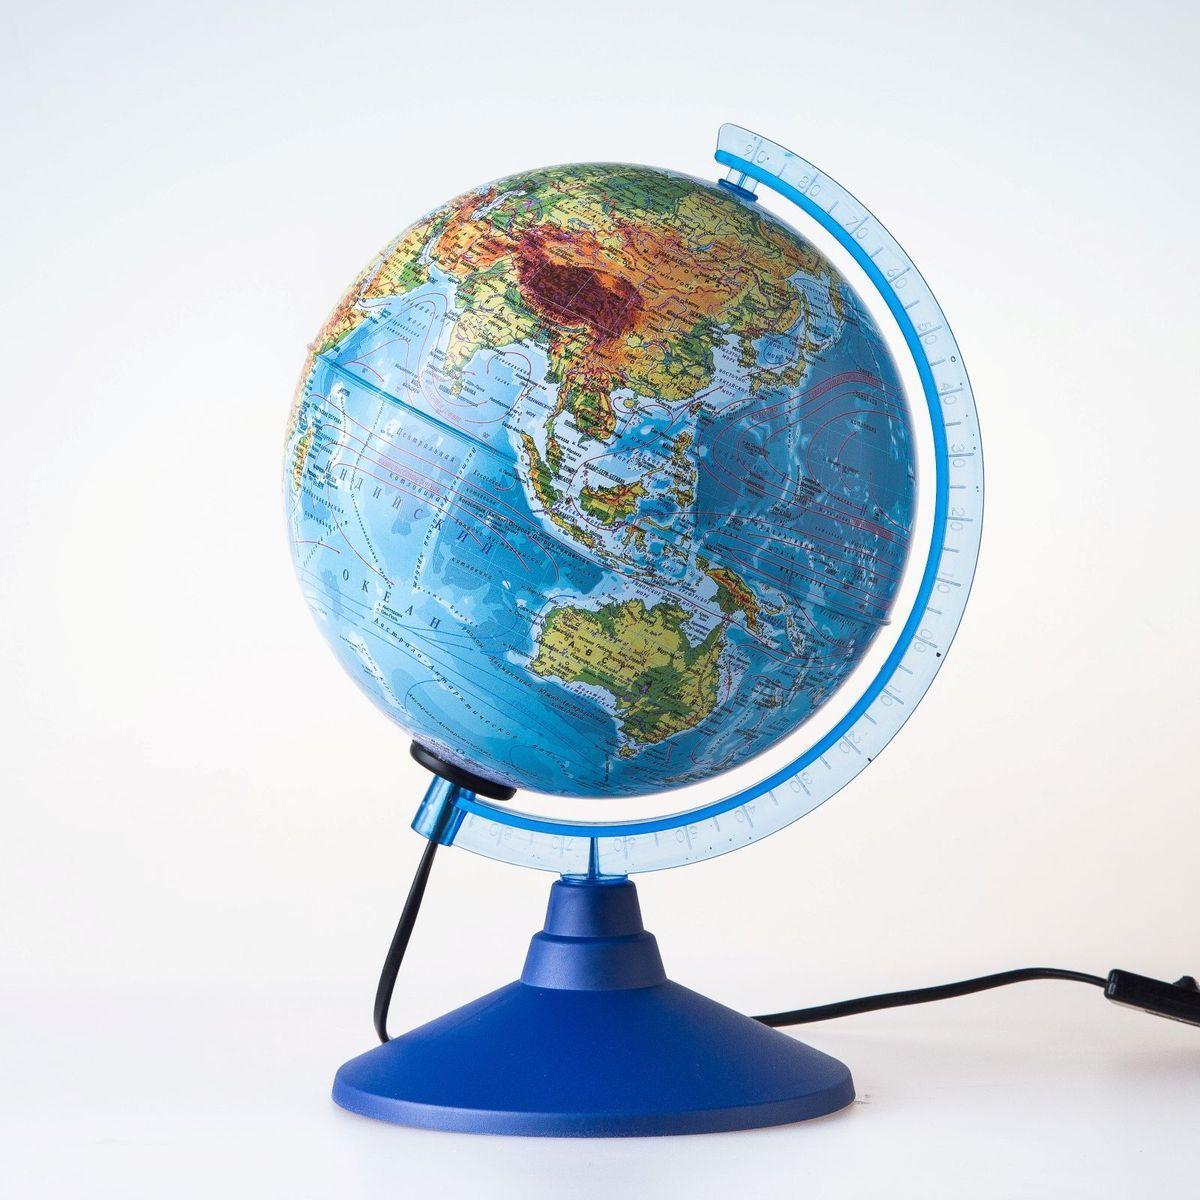 Глобен Глобус физический Классик Евро диаметр 15 см 1072878